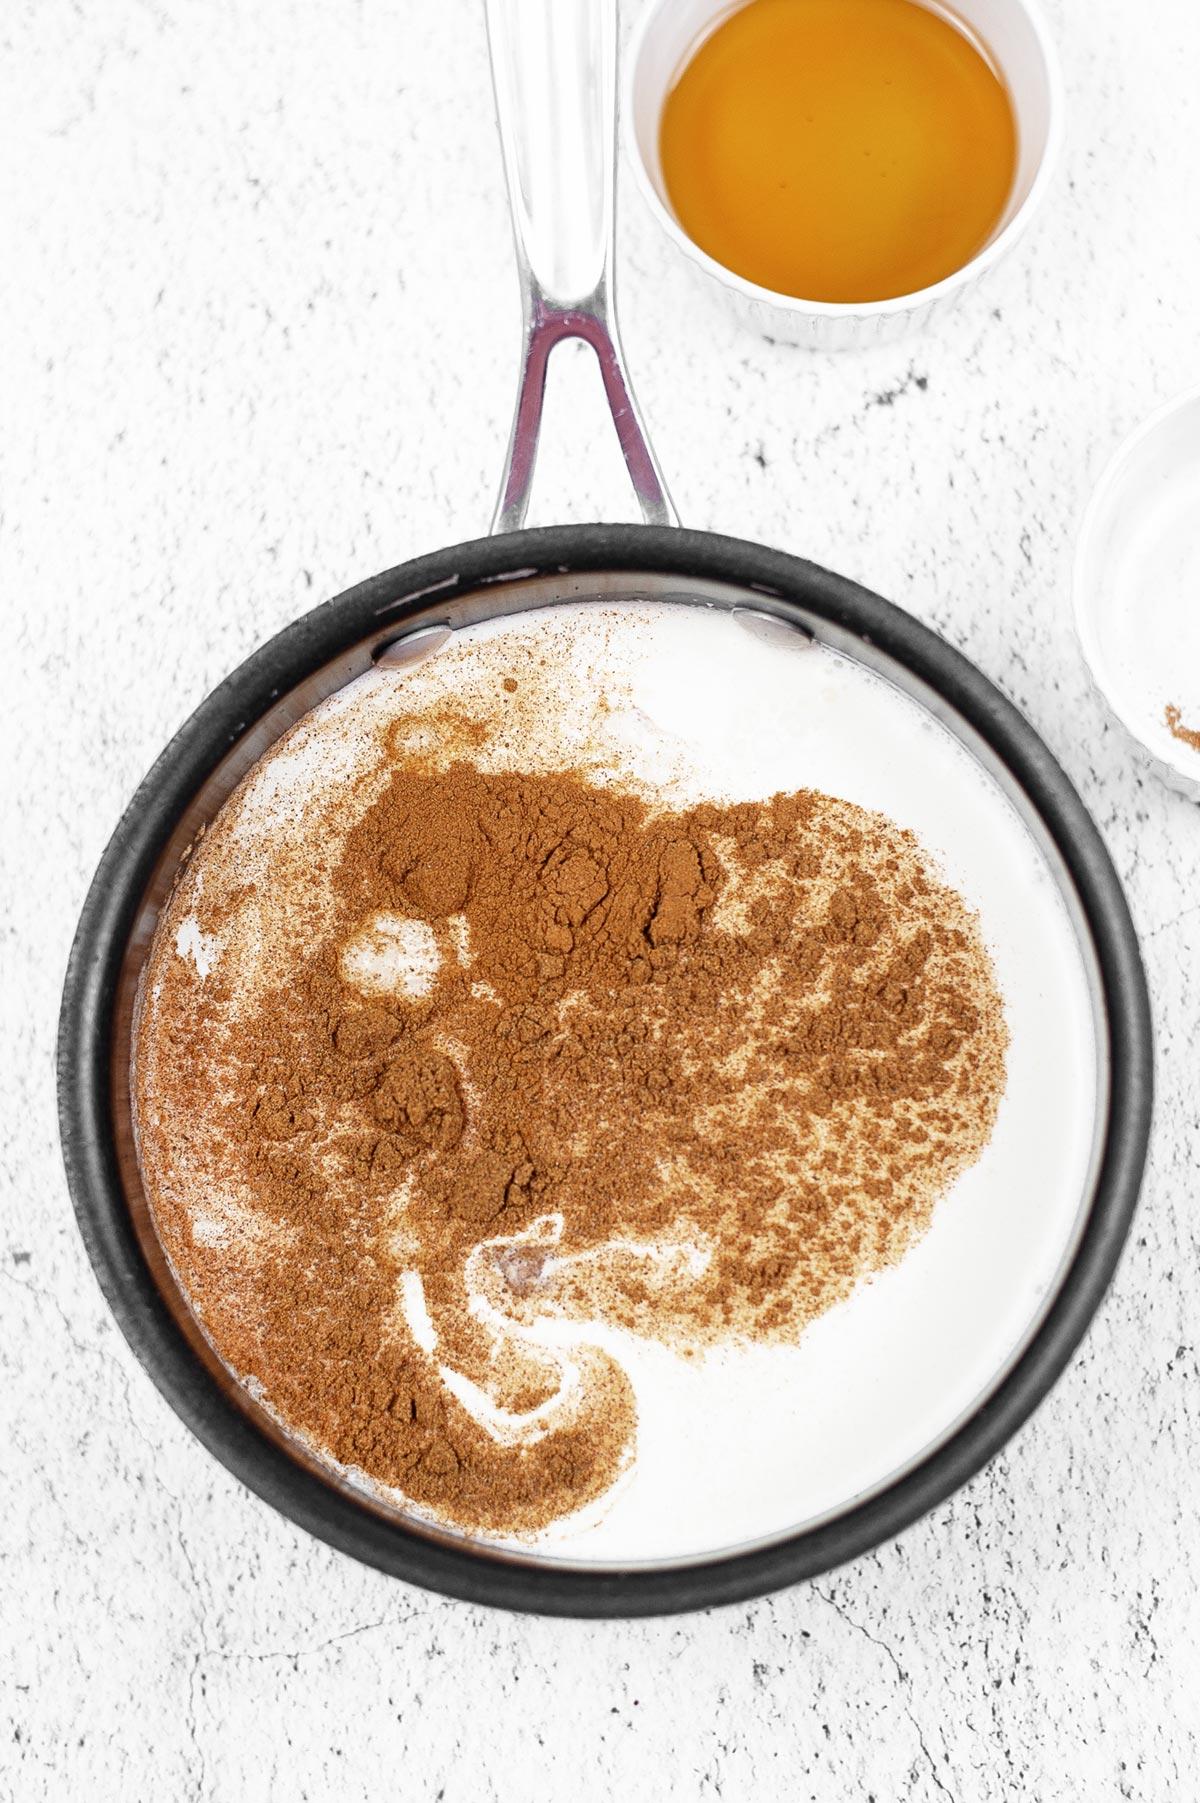 Pumpkin Creamer in Pan